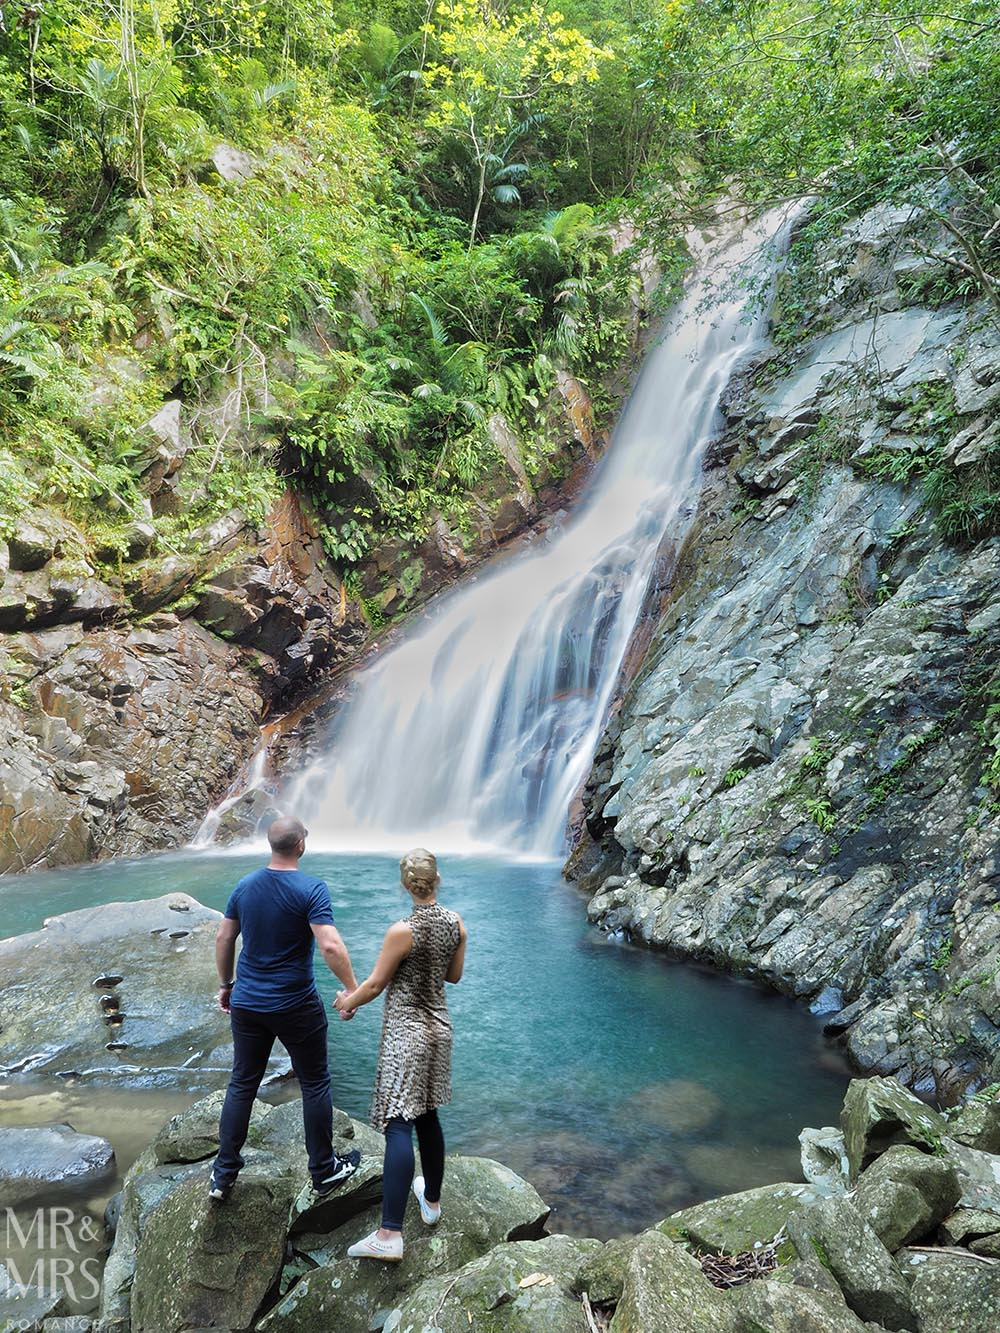 Okinawa waterfall